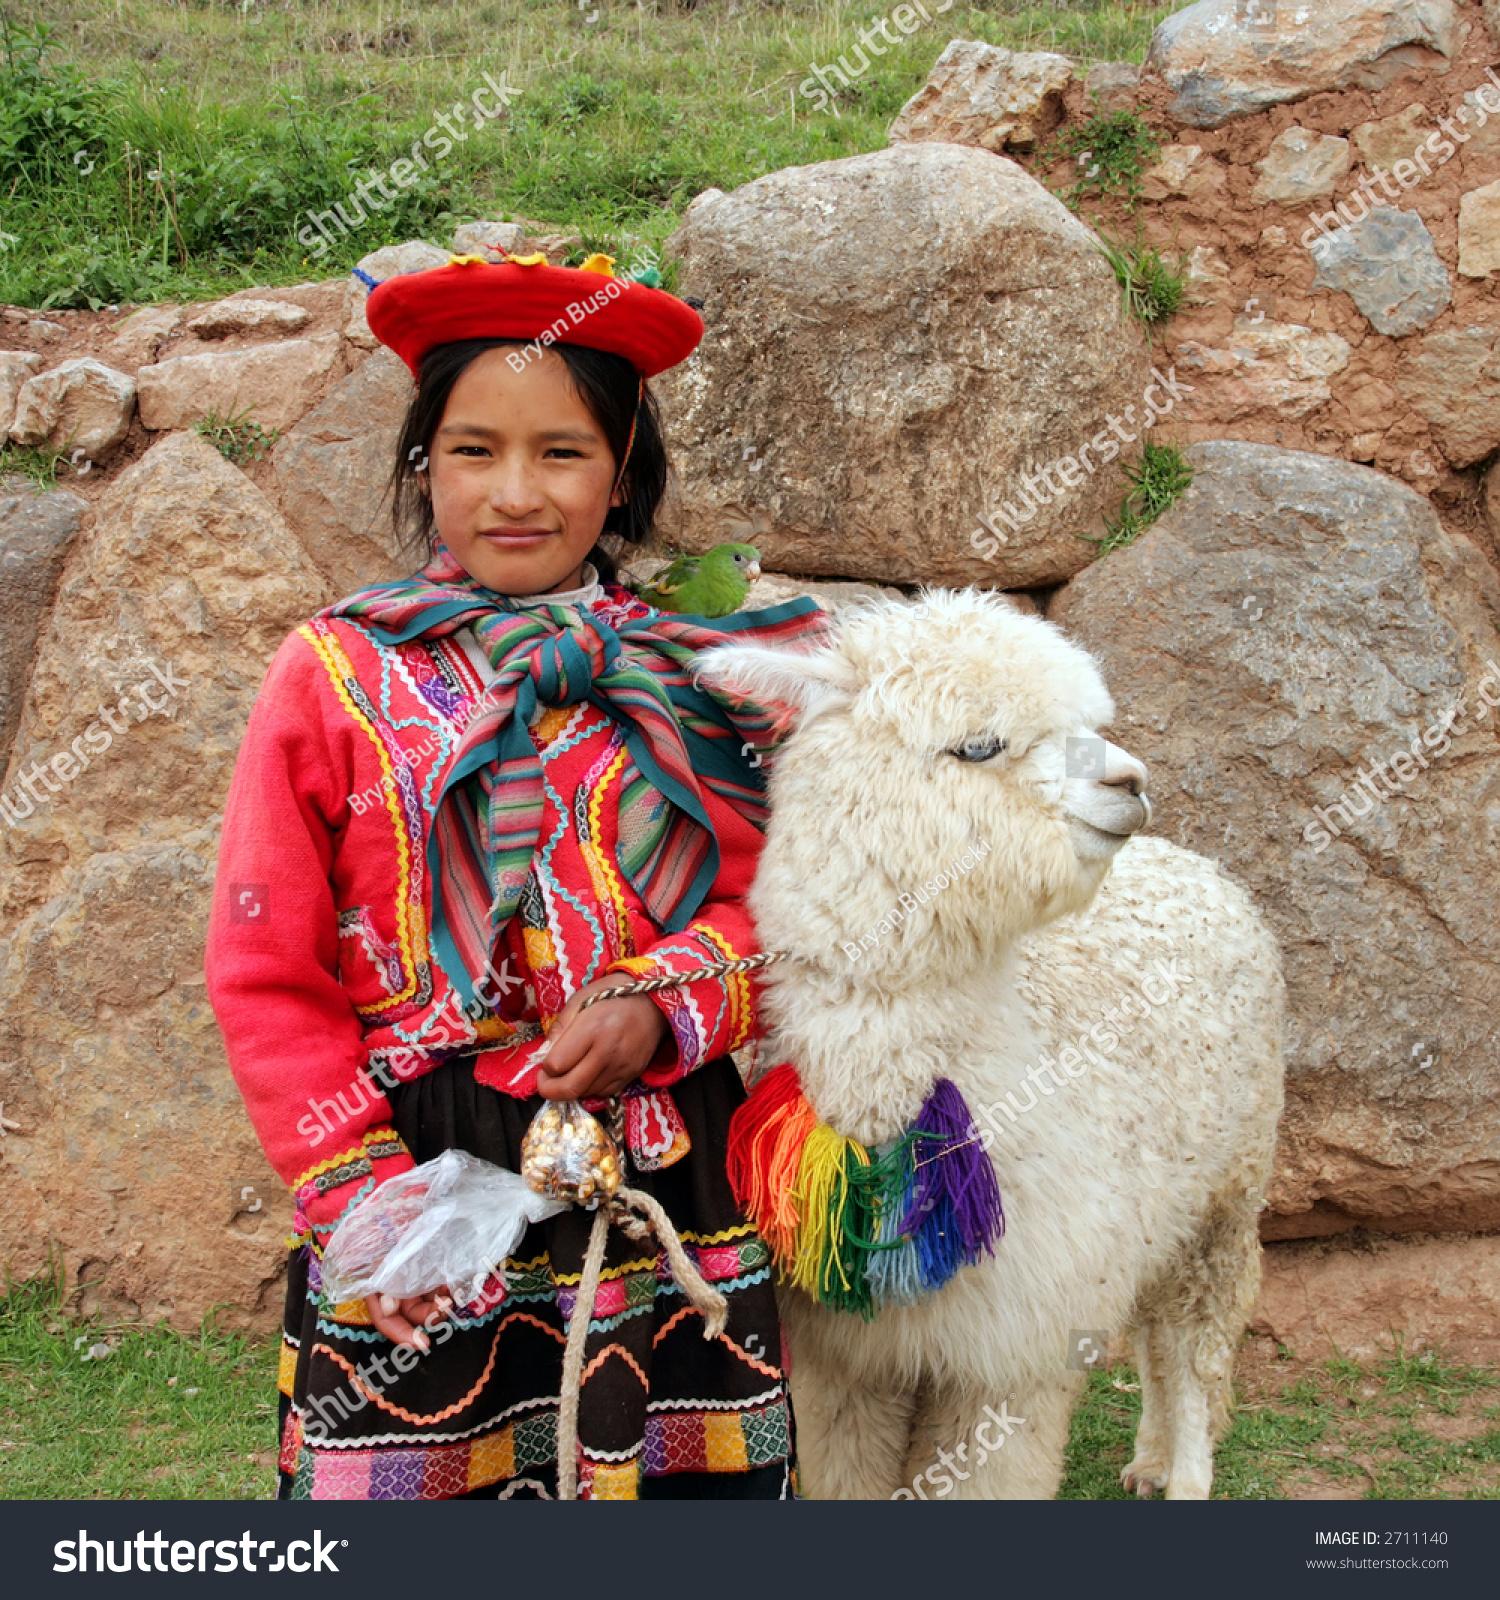 Peru Travel Tips Common Peruvian Phrases For Travel: Peruvian Girl Traditional Dress Ruins Bird Stock Photo